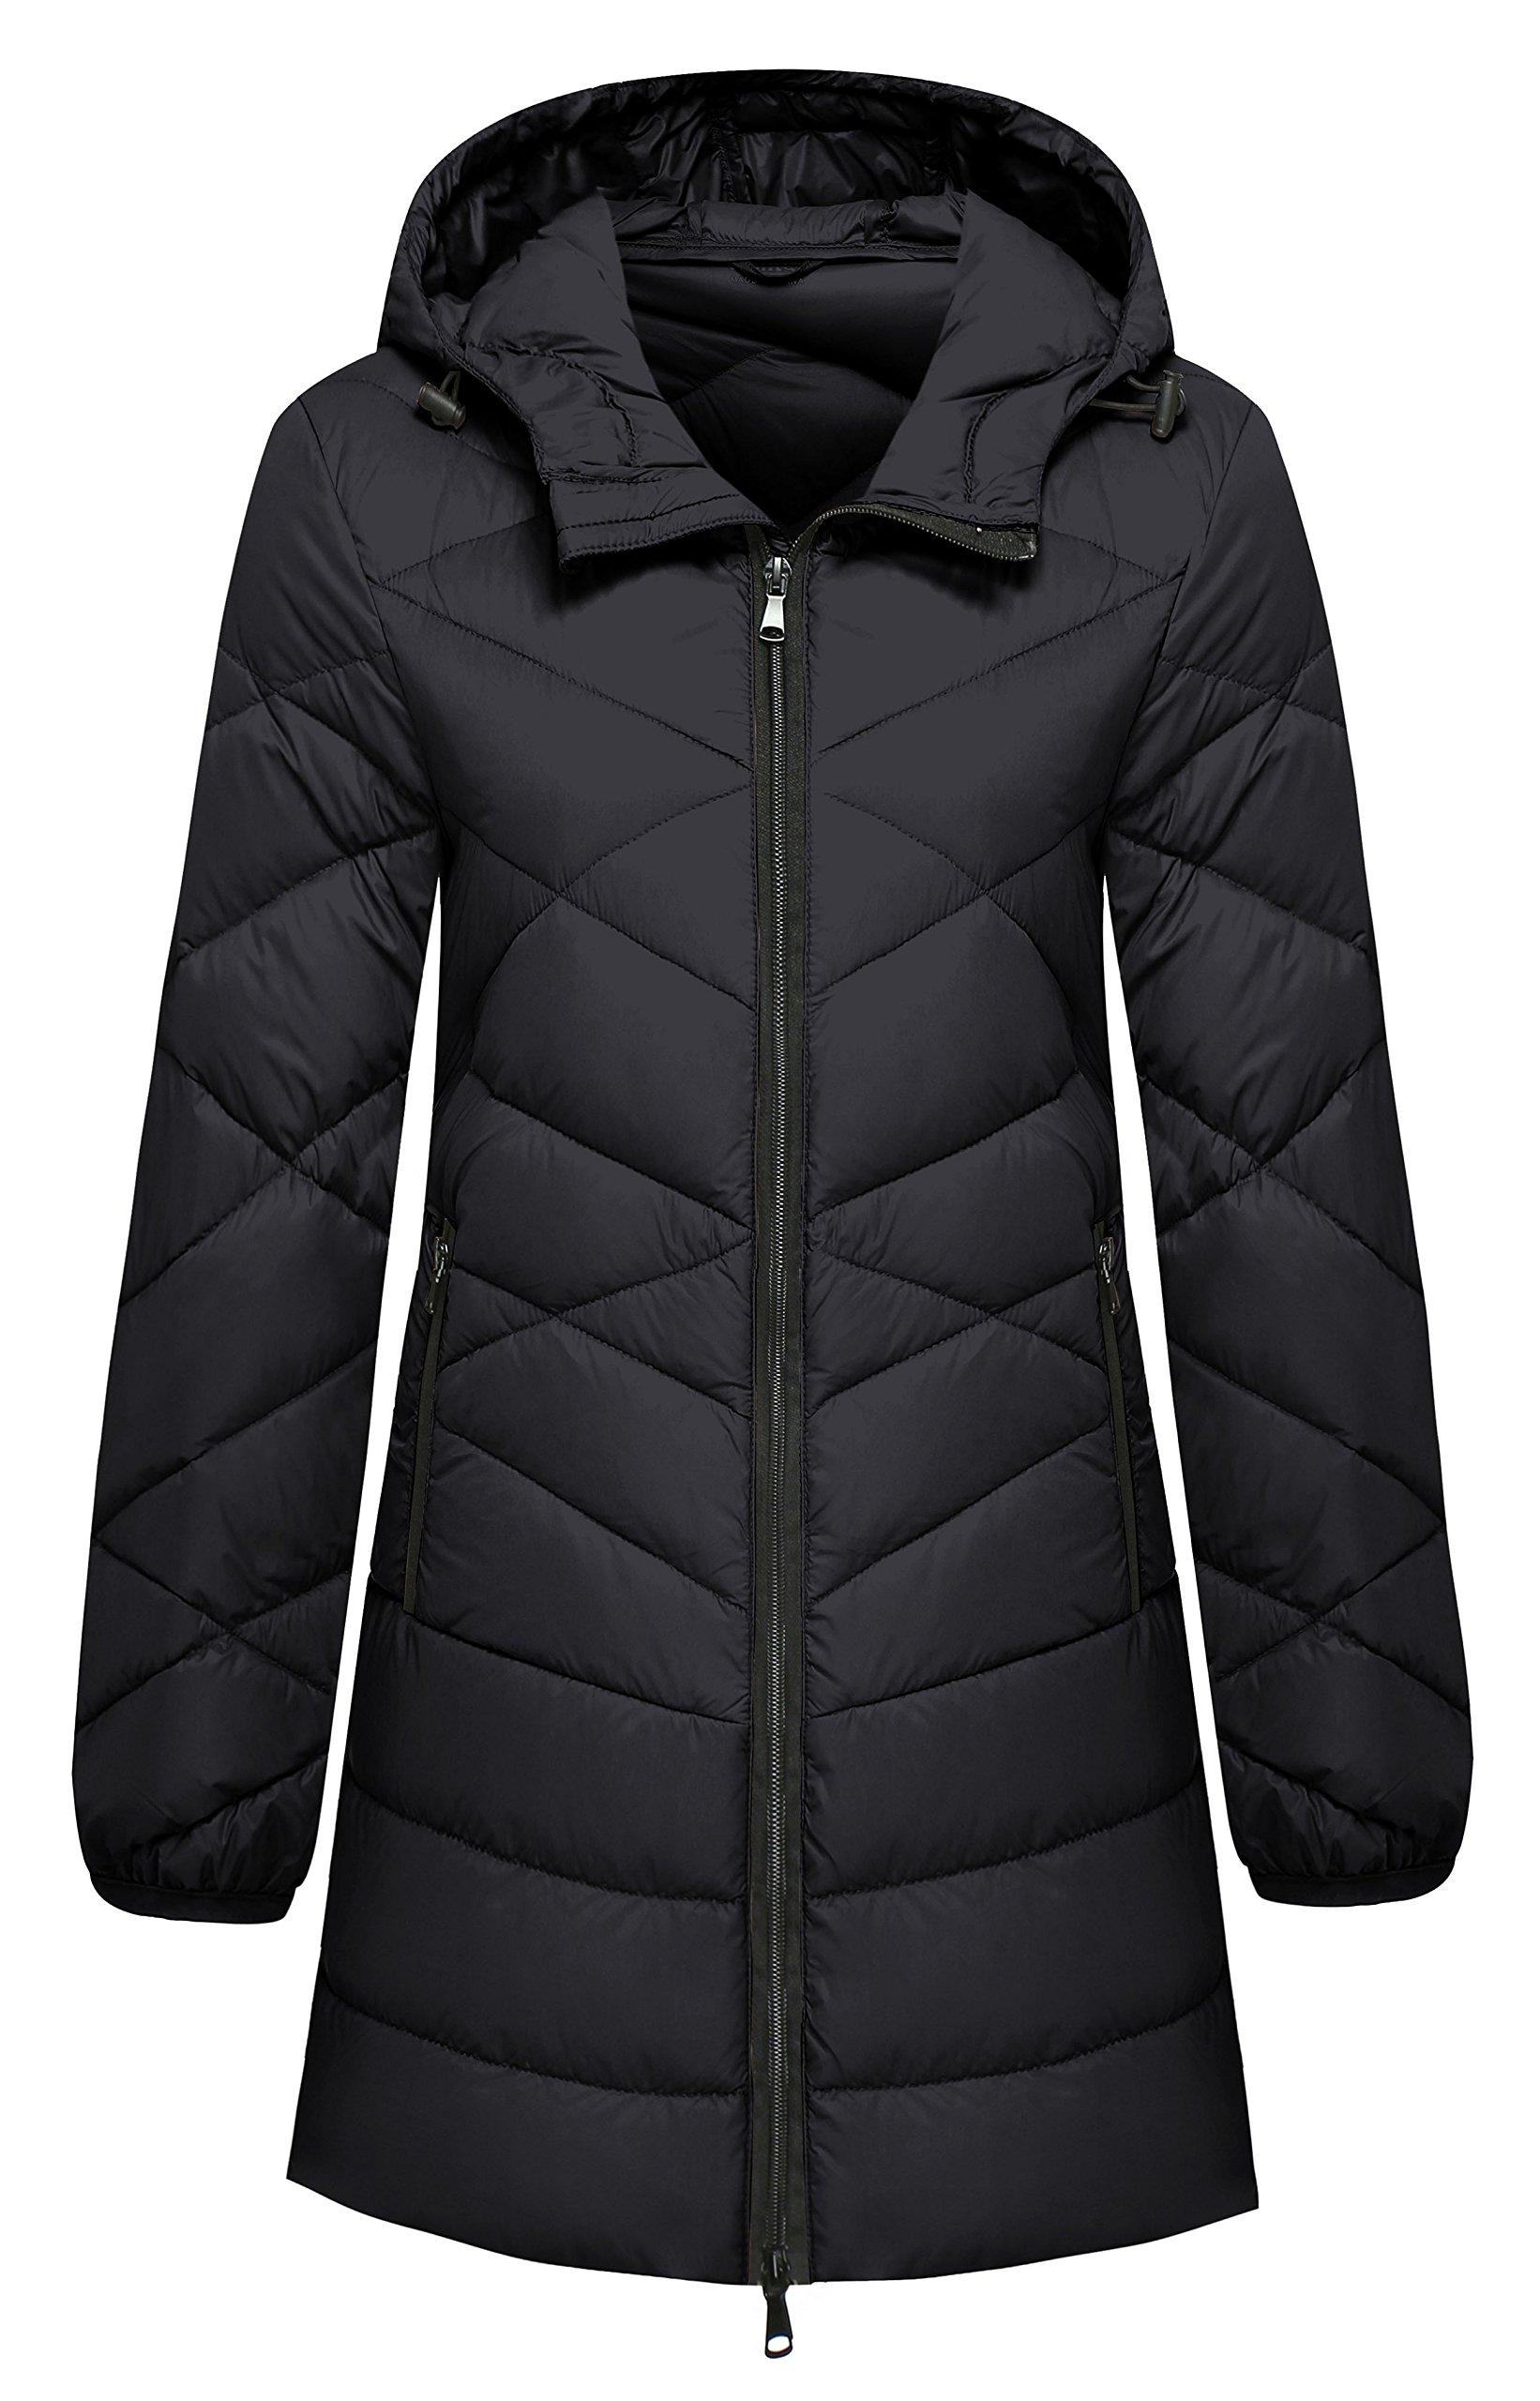 Wantdo Women's Hooded Packable Lightweight Long Down Coat, Black, Small